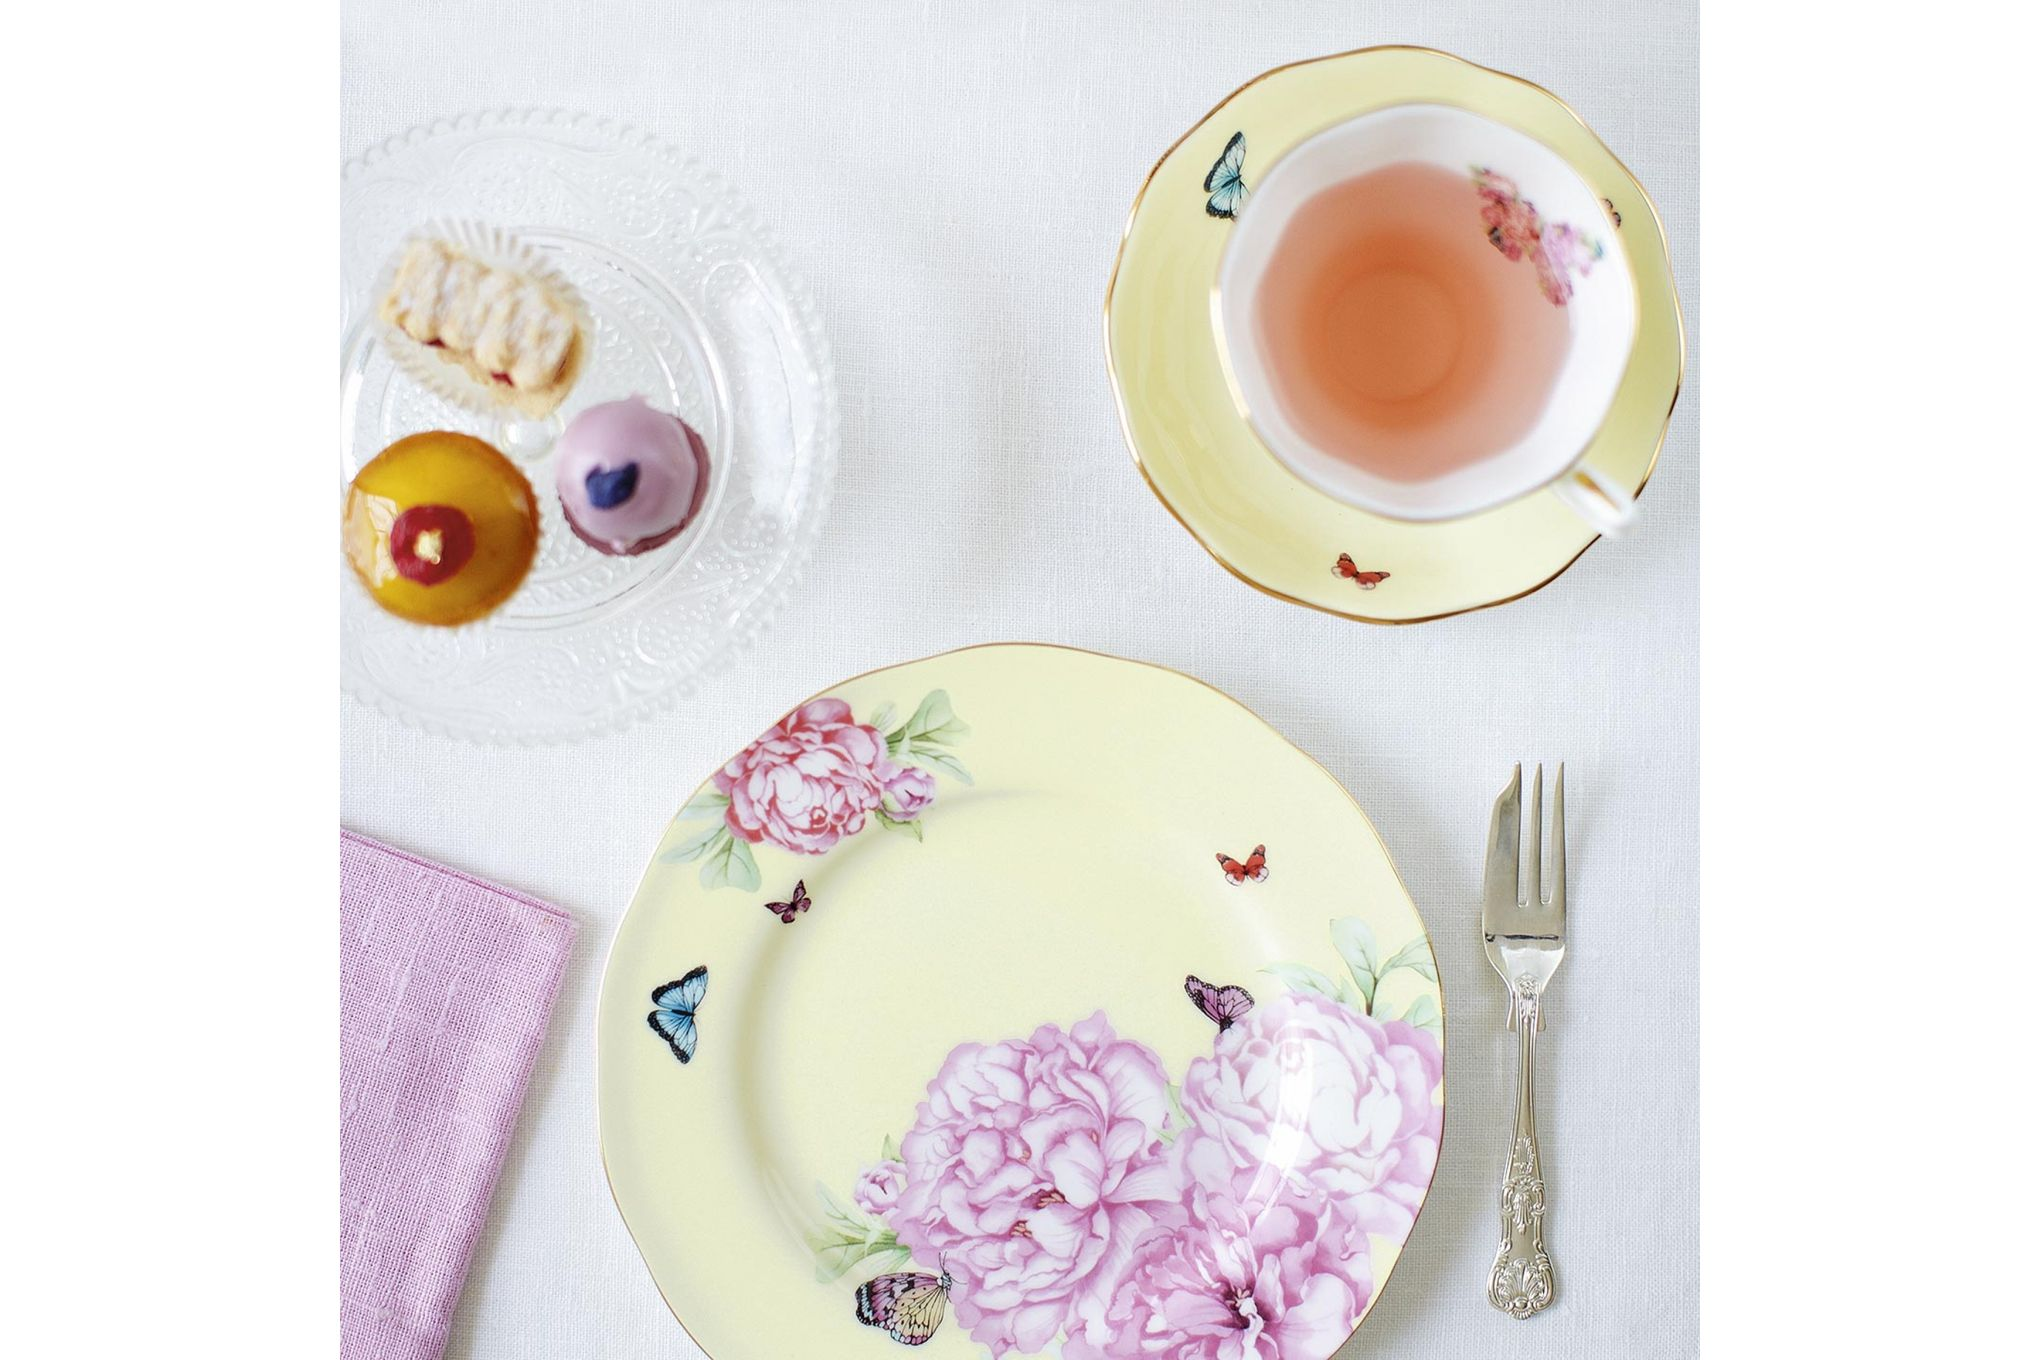 Miranda Kerr for Royal Albert Joy 3 Piece Set Teacup, Saucer, Plate 20cm Joy thumb 3